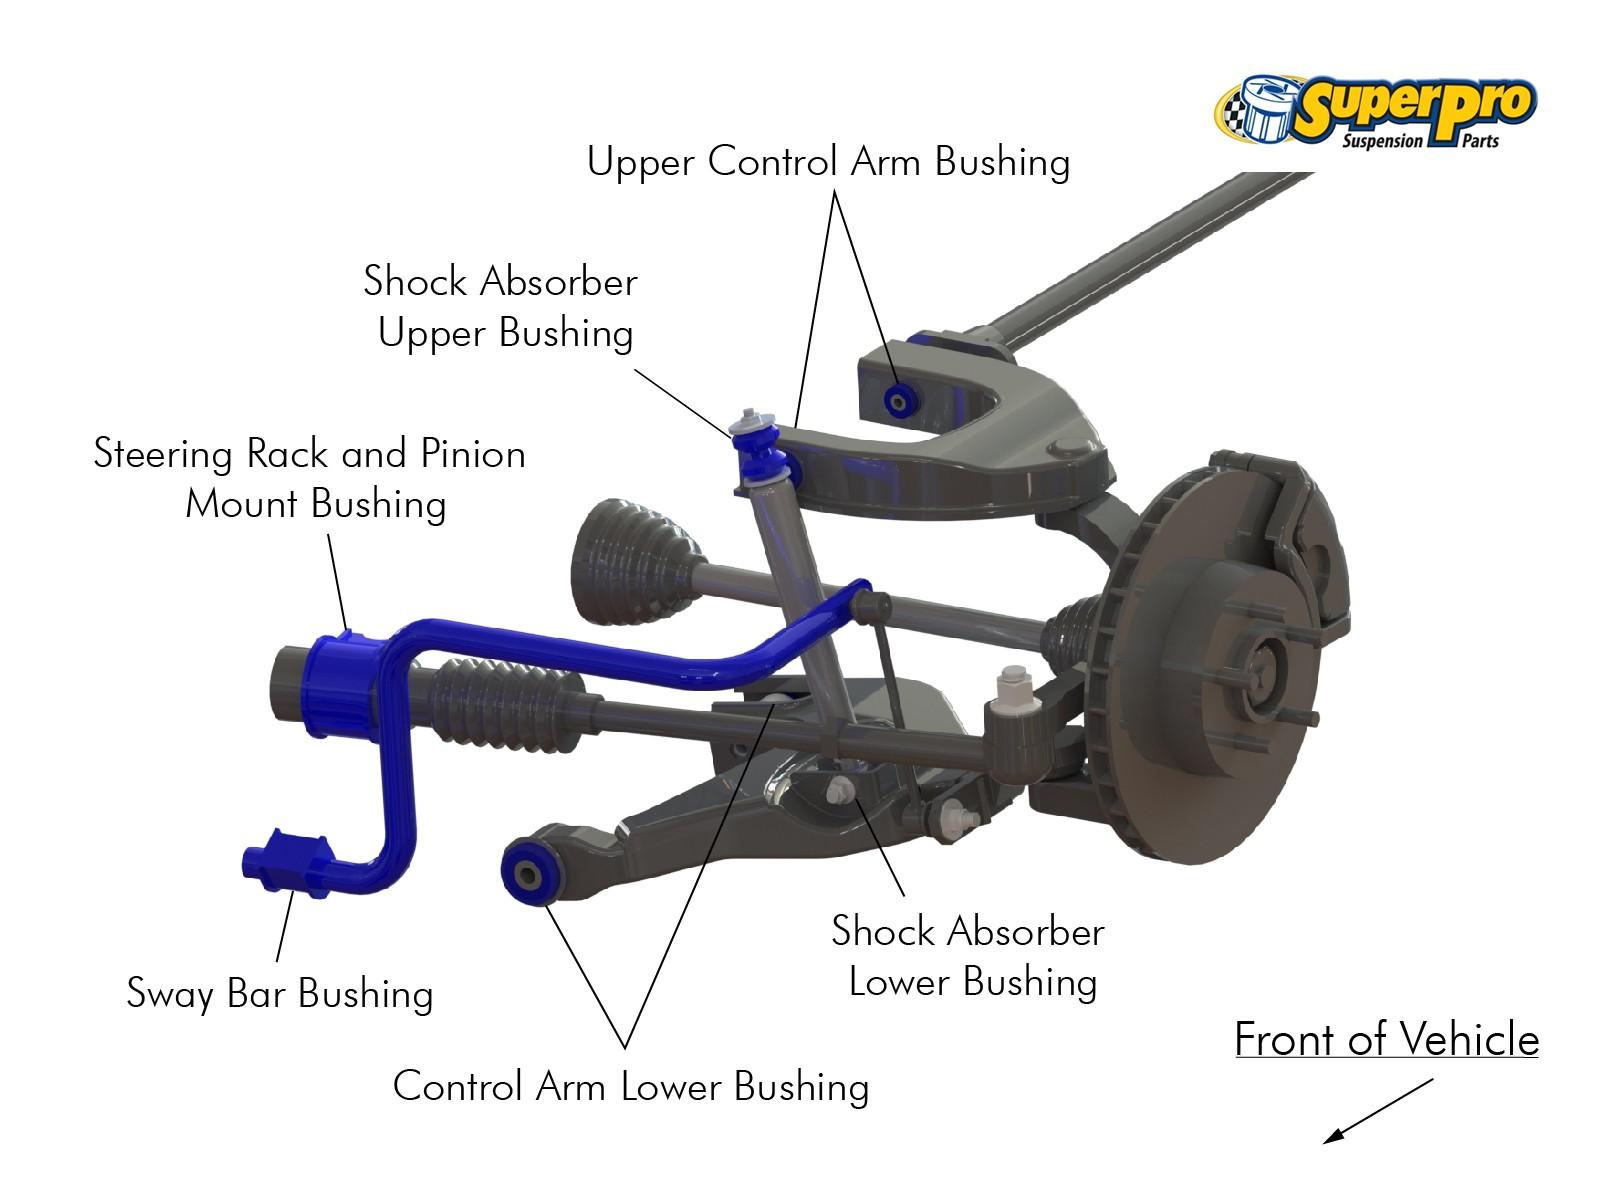 Rack and Pinion Parts Diagram Superpro Tradeview Suspension Part Search Of Rack and Pinion Parts Diagram